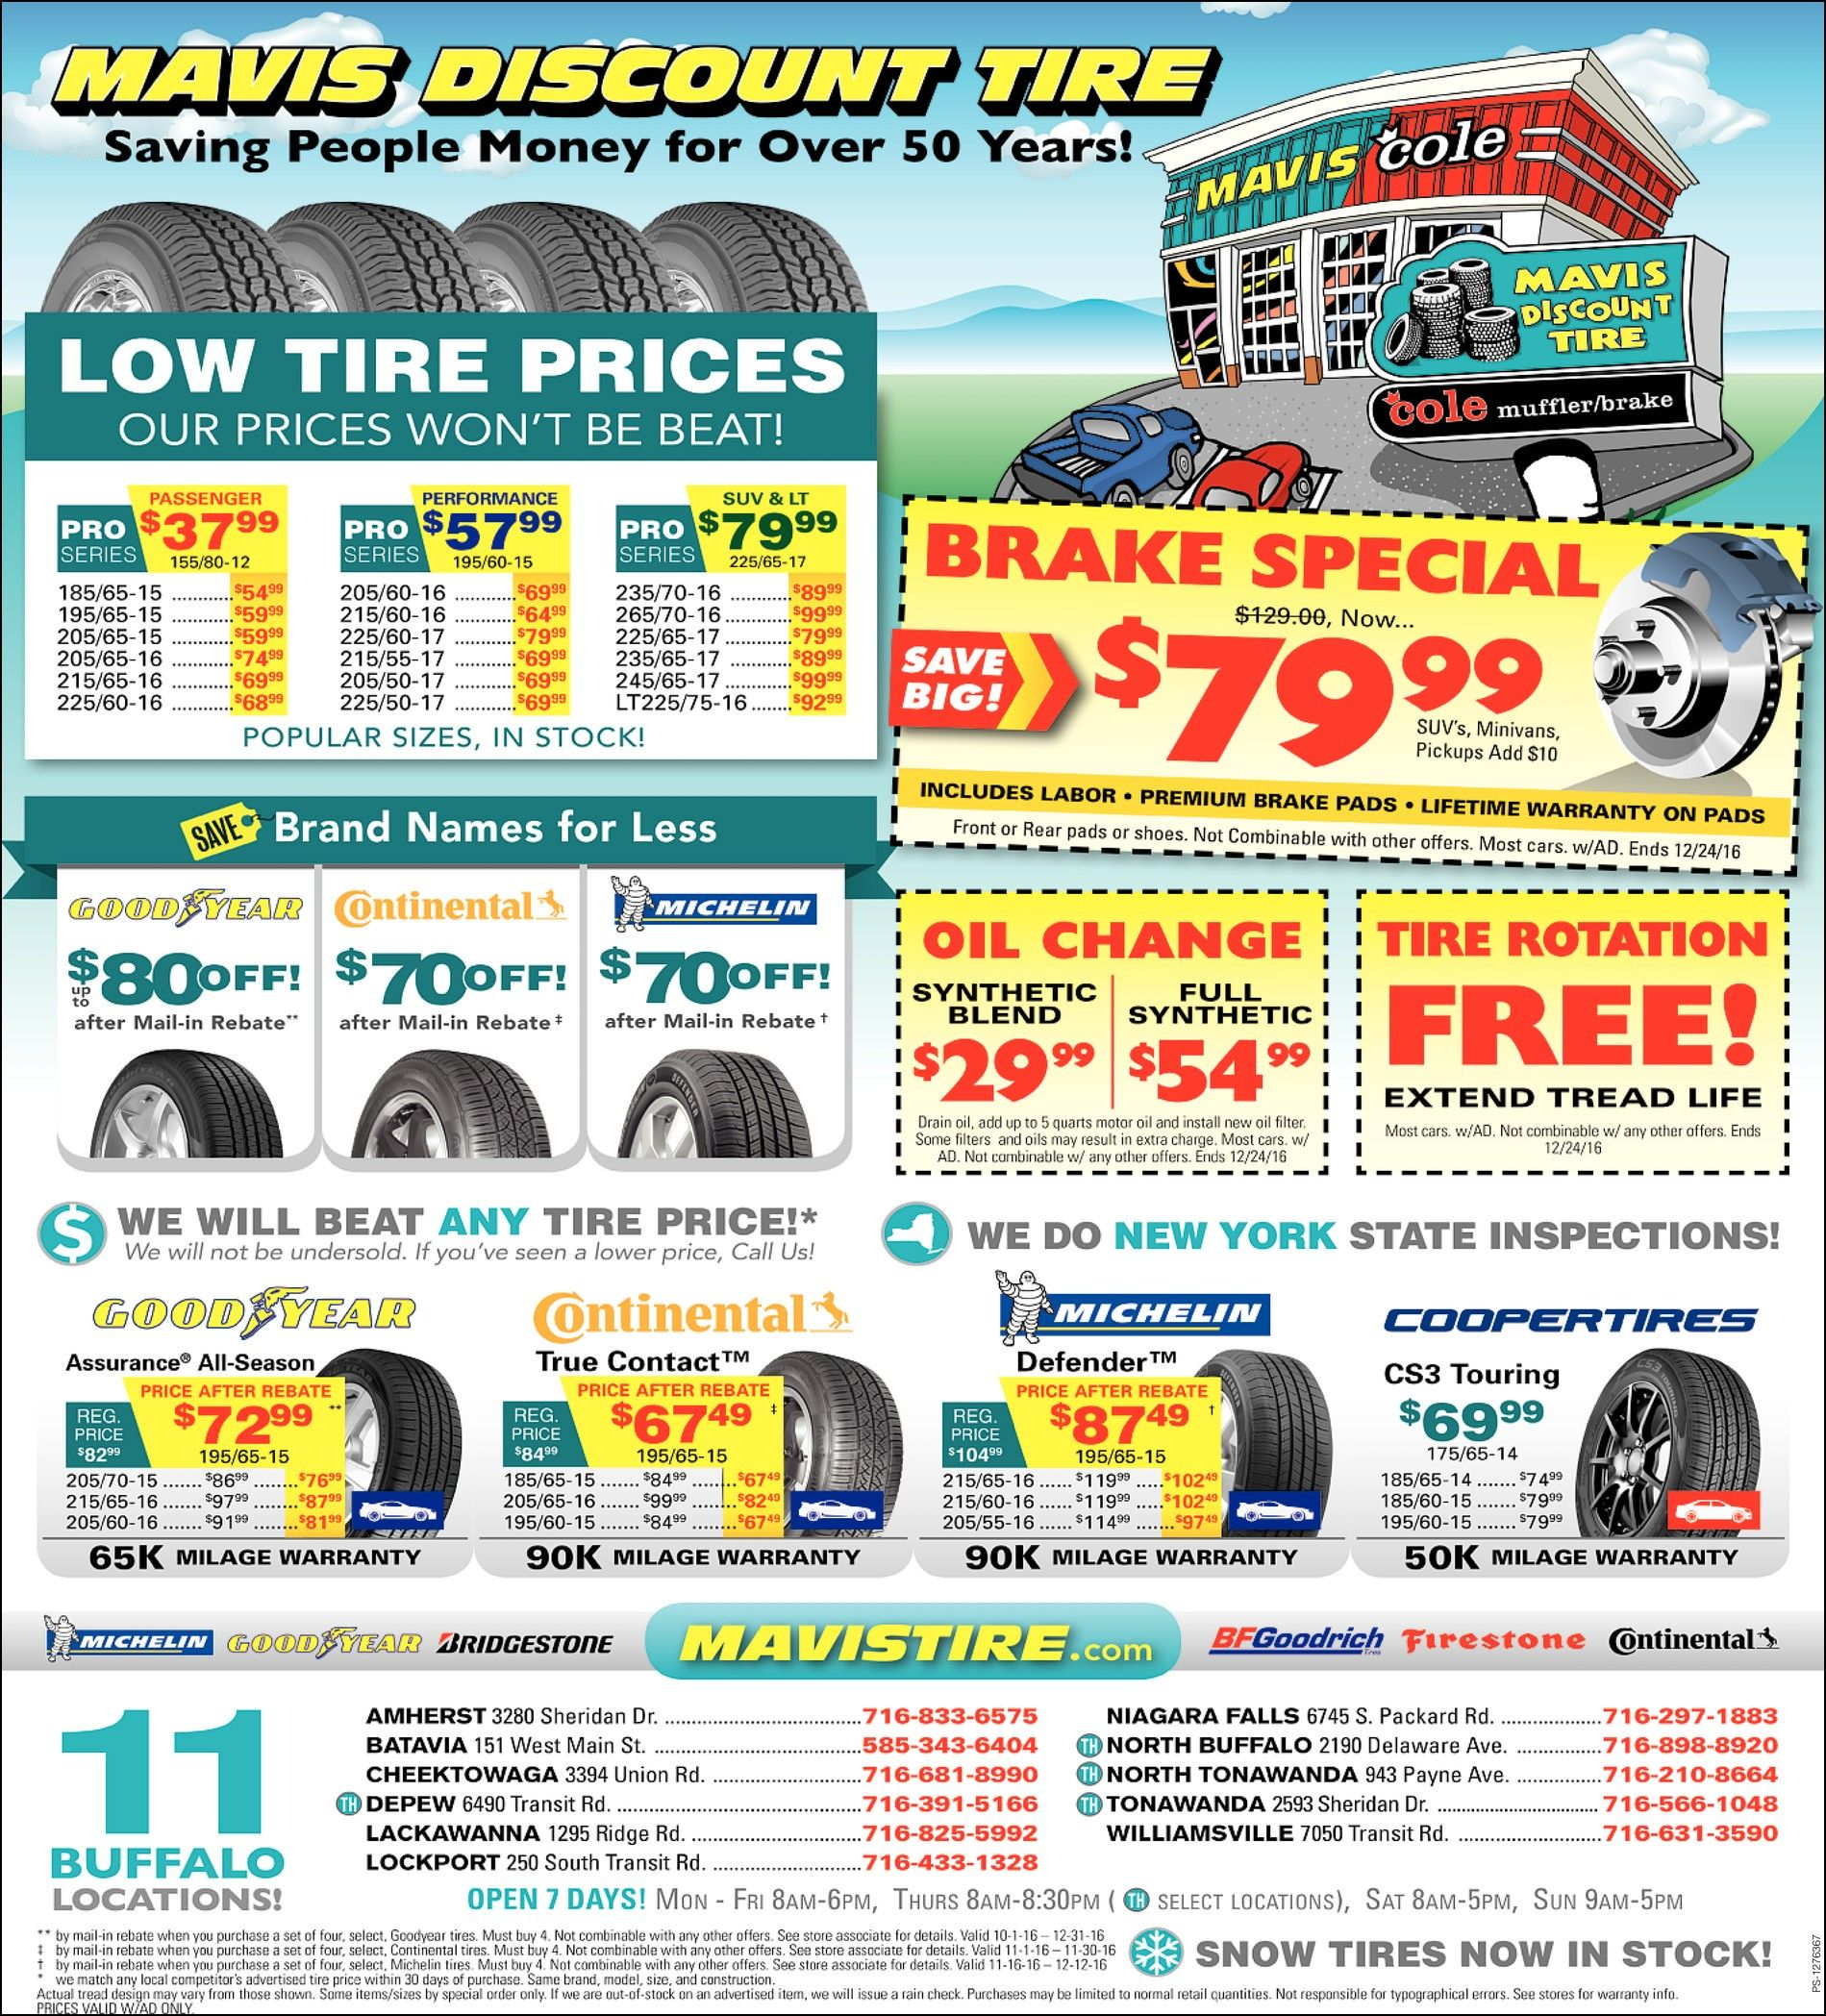 Mavis Tire Discount Coupons Wheels Tires Gallery